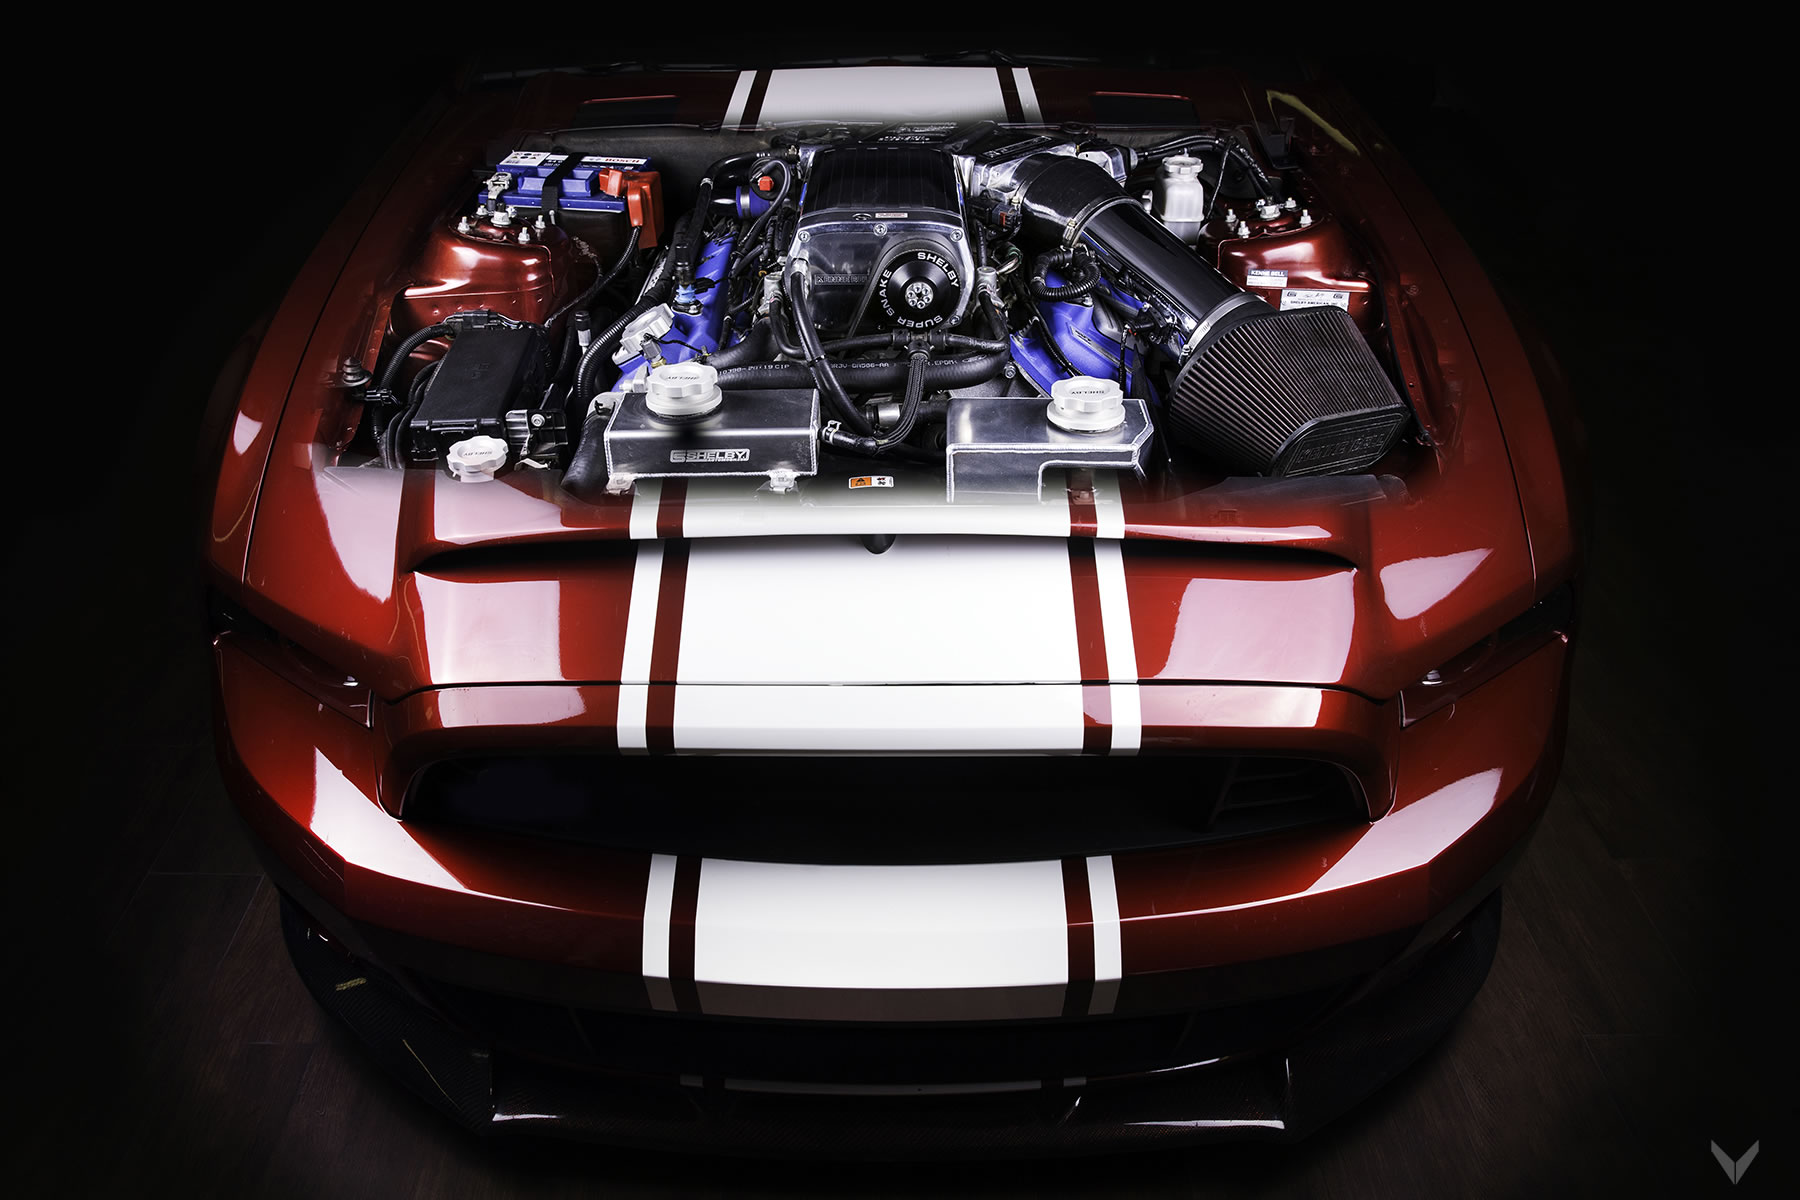 2016 Vilner Shelby Mustang Gt500 Super Snake Oto Kokpit